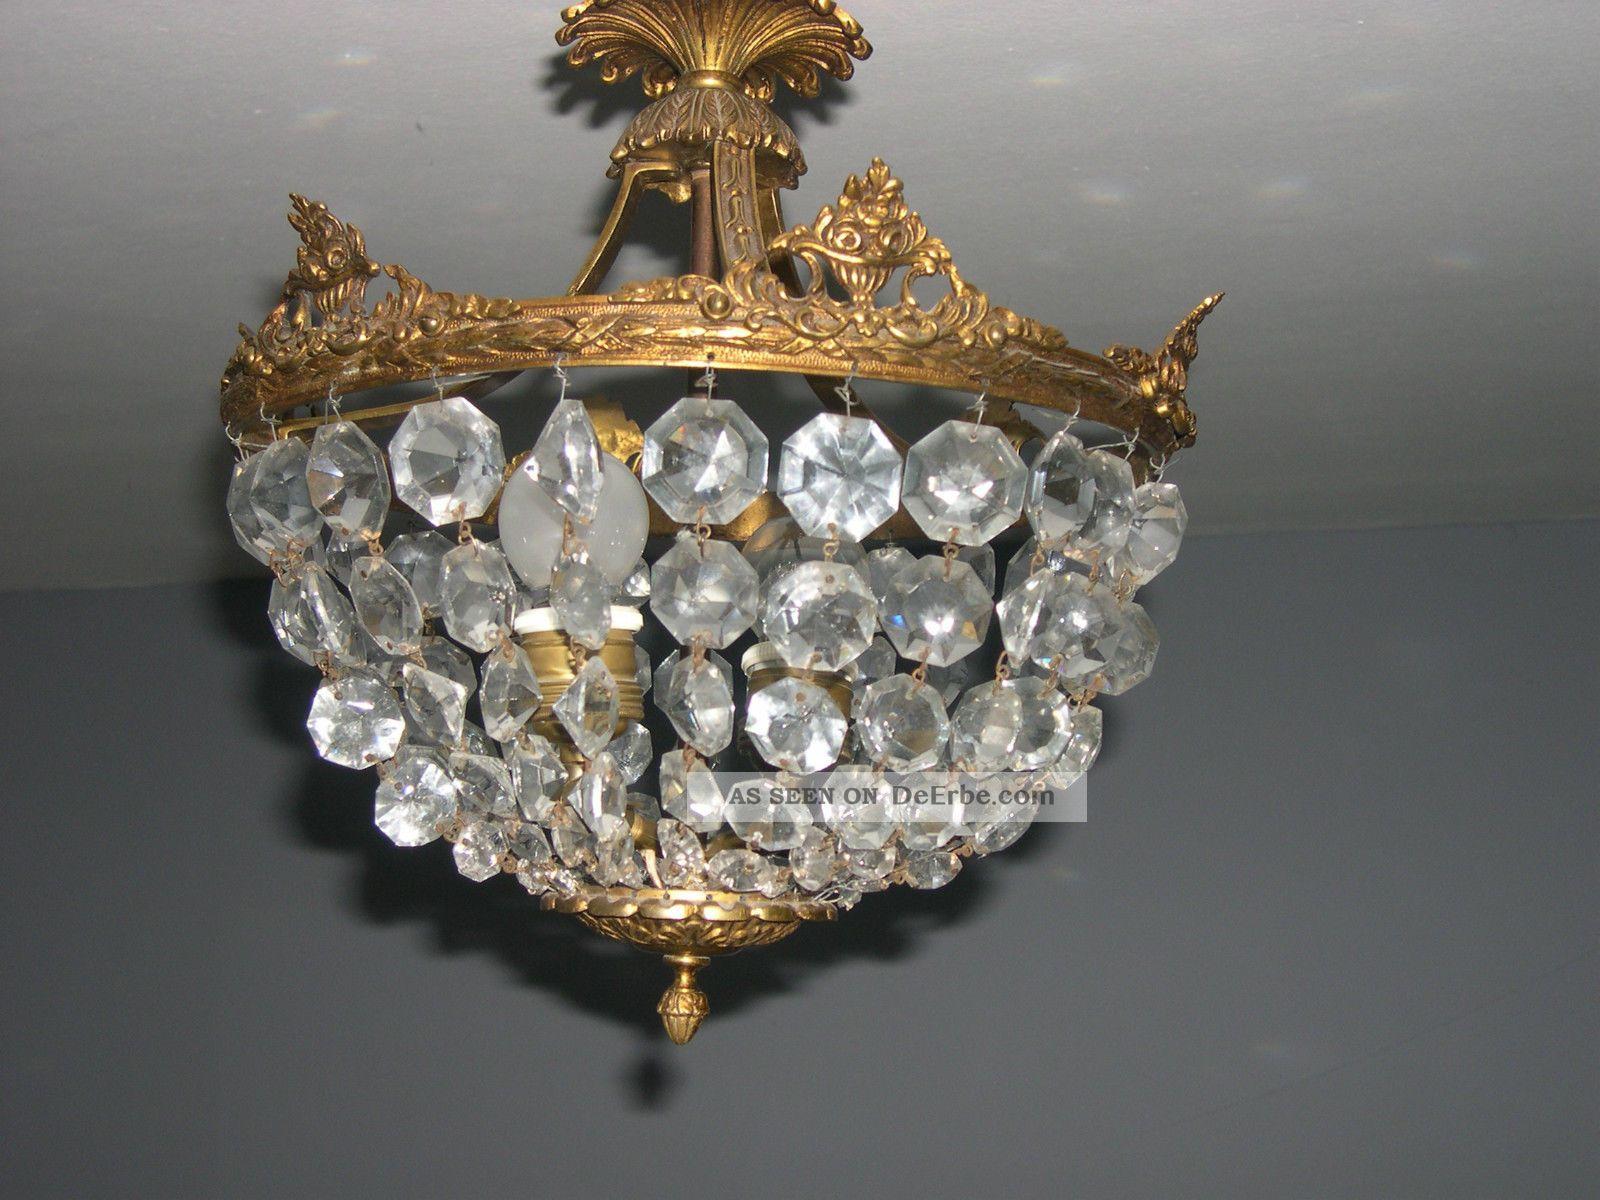 Plafoniere Kristall Antik : Plafoniere kristall groß sac a perle schöne prächtige messing